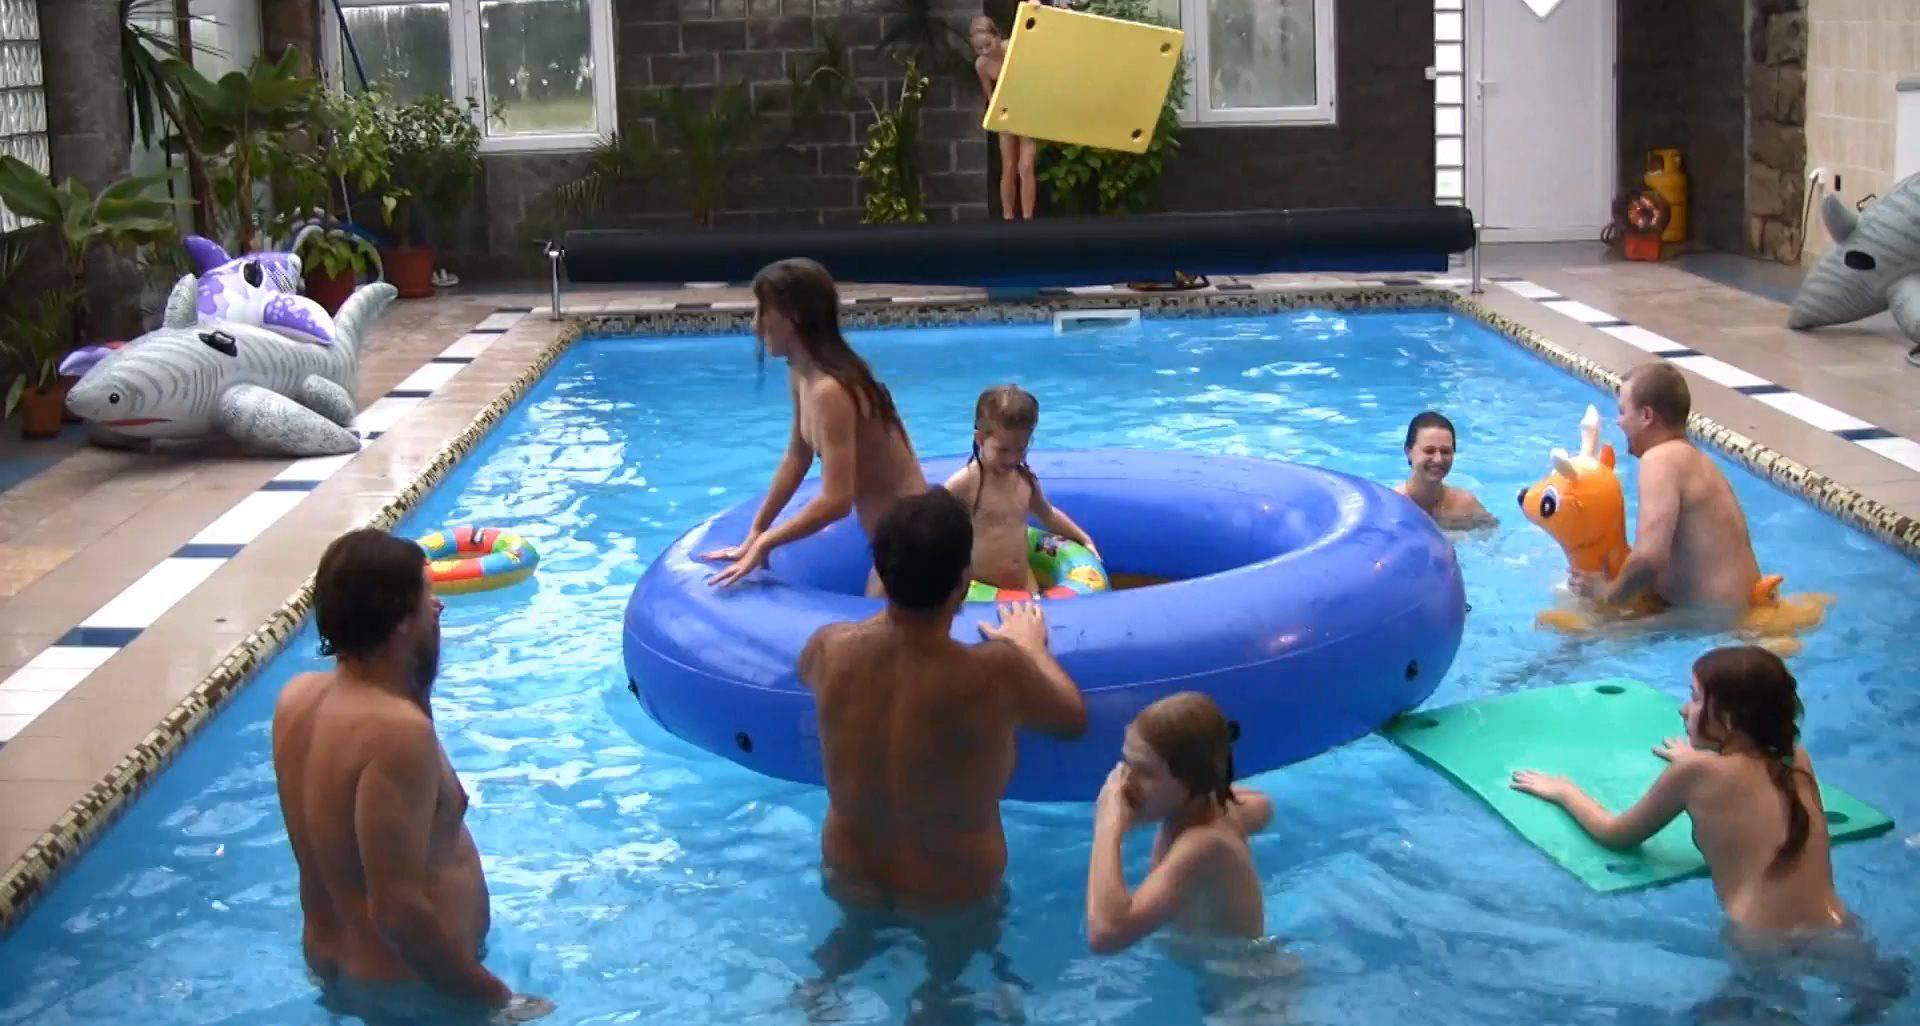 FKK Videos Piano Pool and Tennis - 2